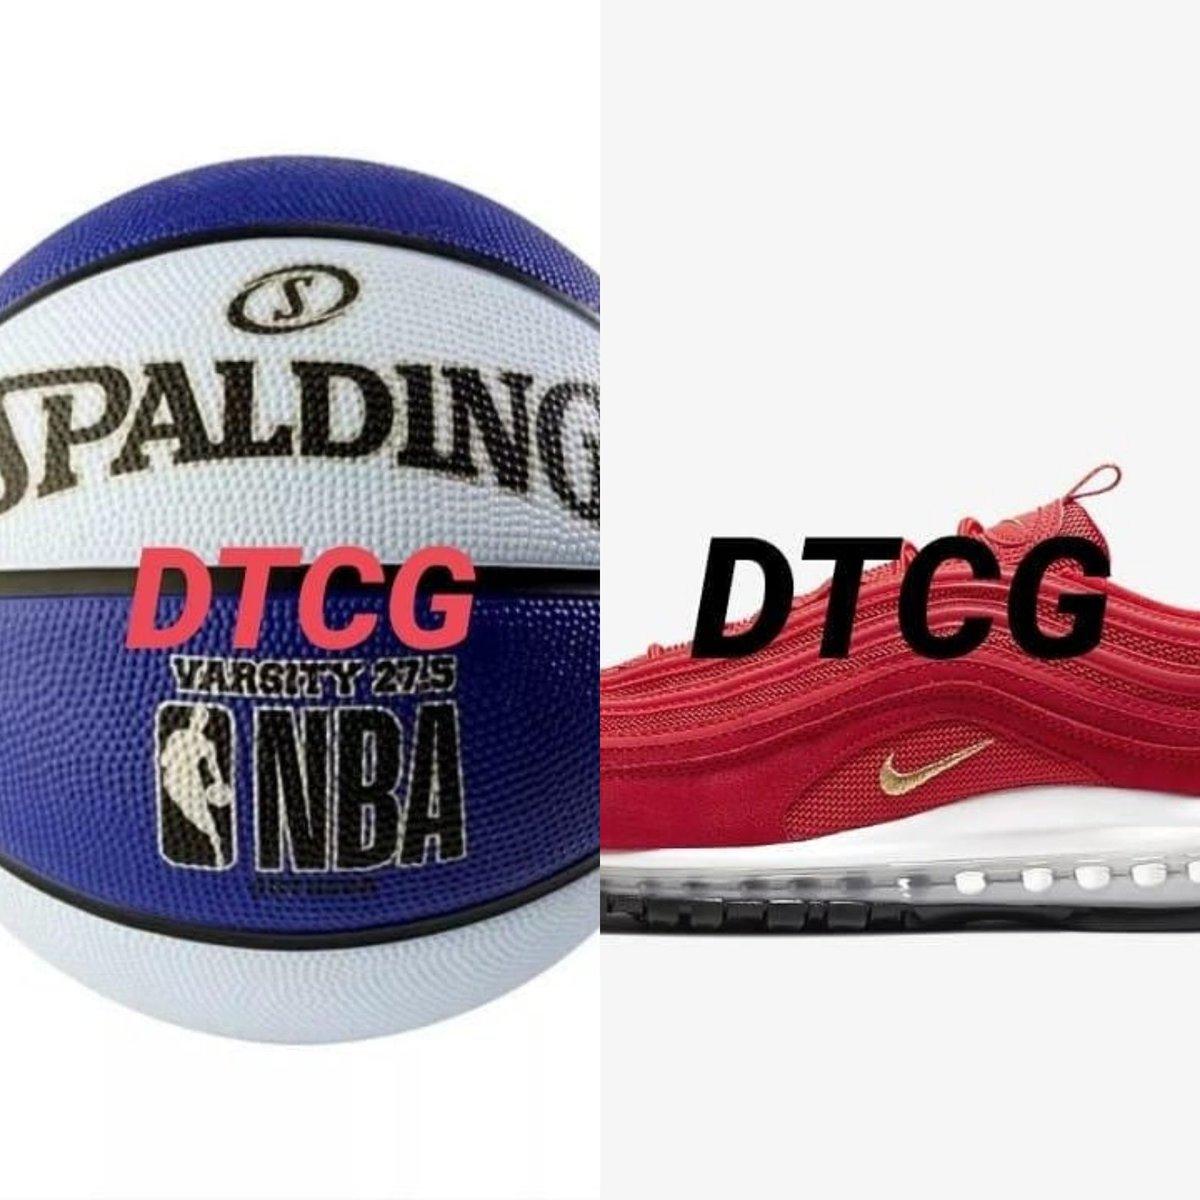 "Spalding 27.5"" Varsity Basketball - Blue/Light Blue ($9.99)  / Nike Air Max 97 Men's Shoe ($170.00)  <br>http://pic.twitter.com/ljcToe2S2g"